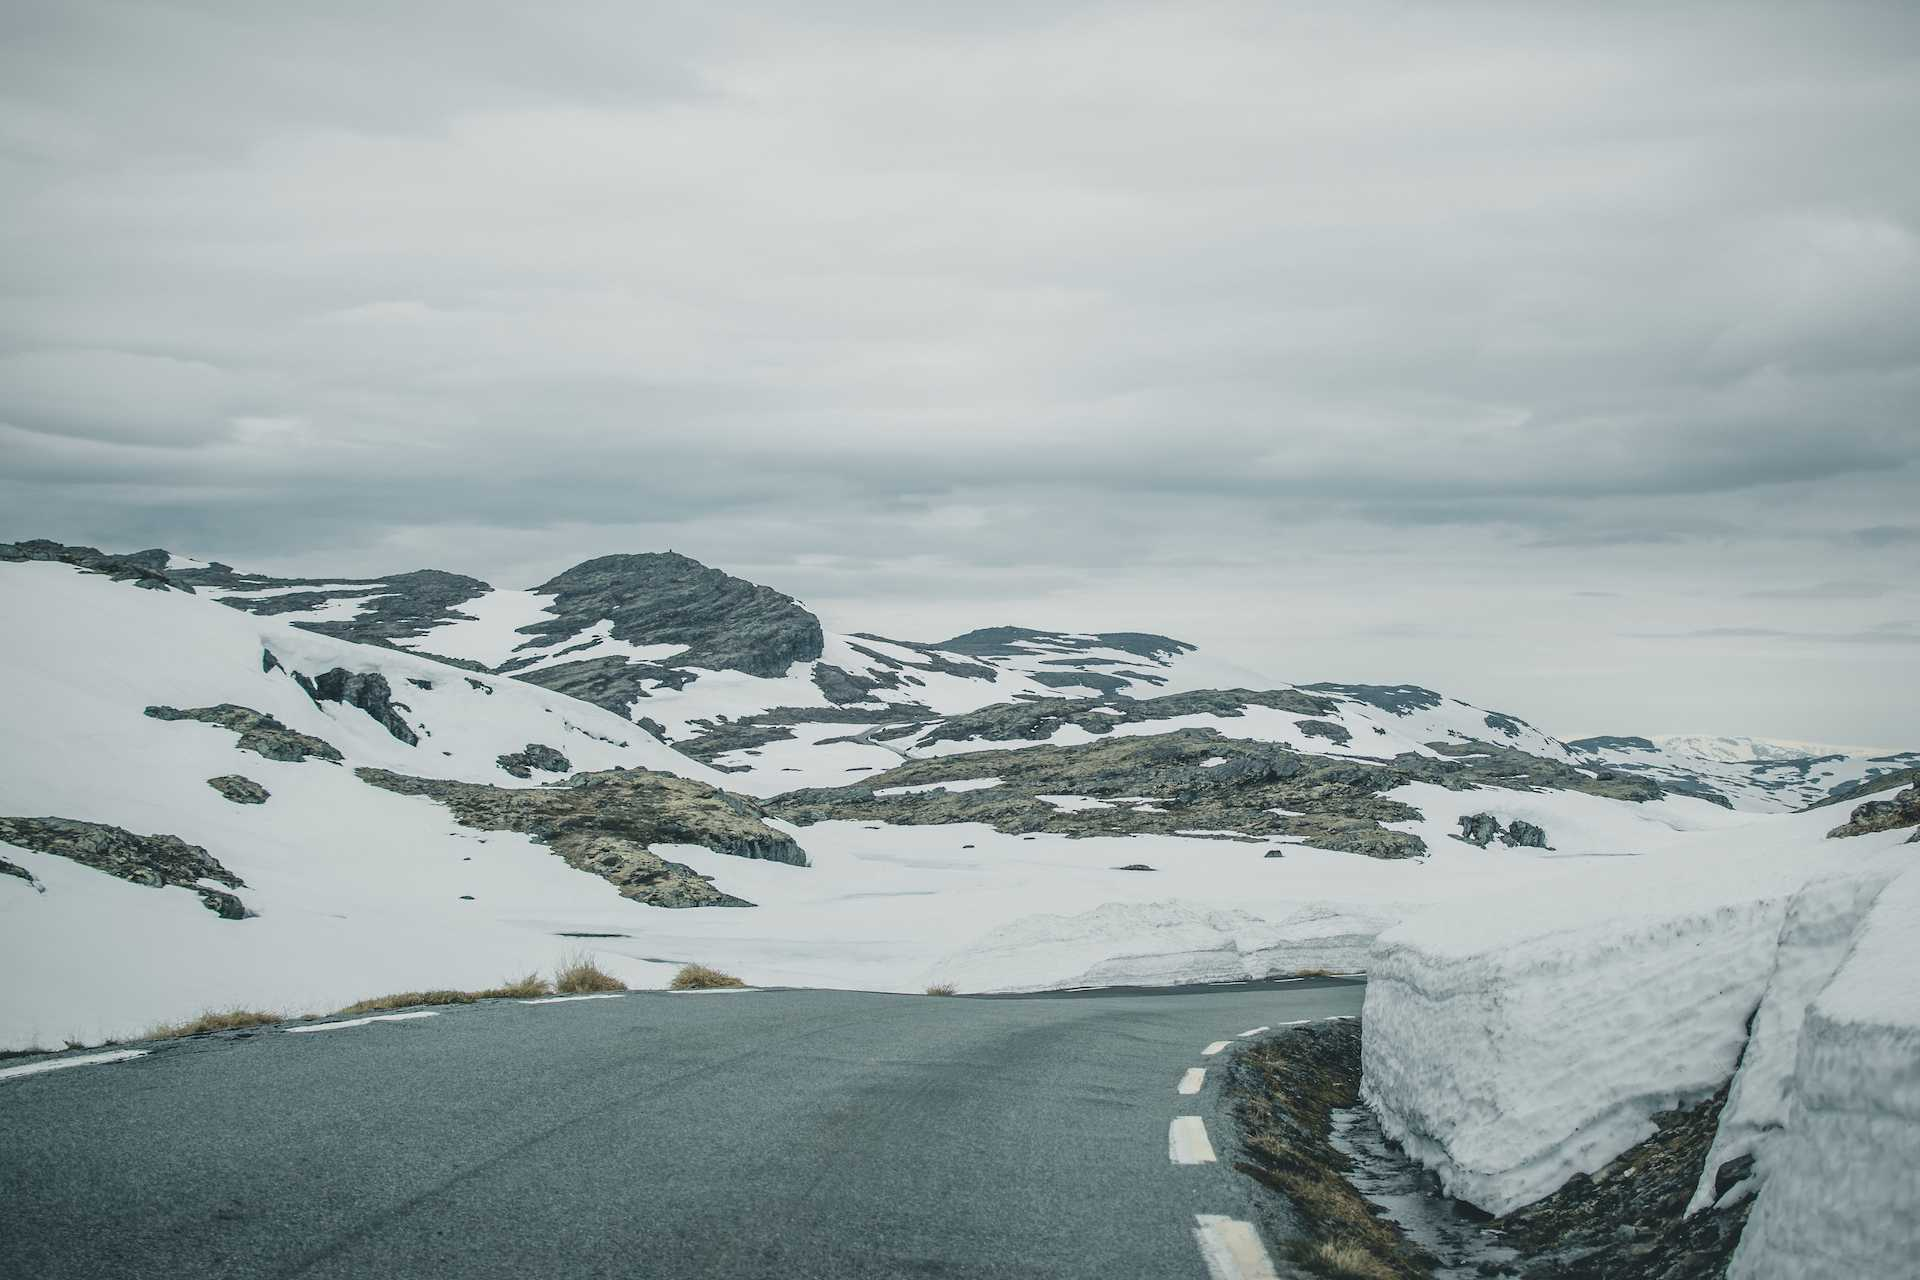 Droga Śnieżna